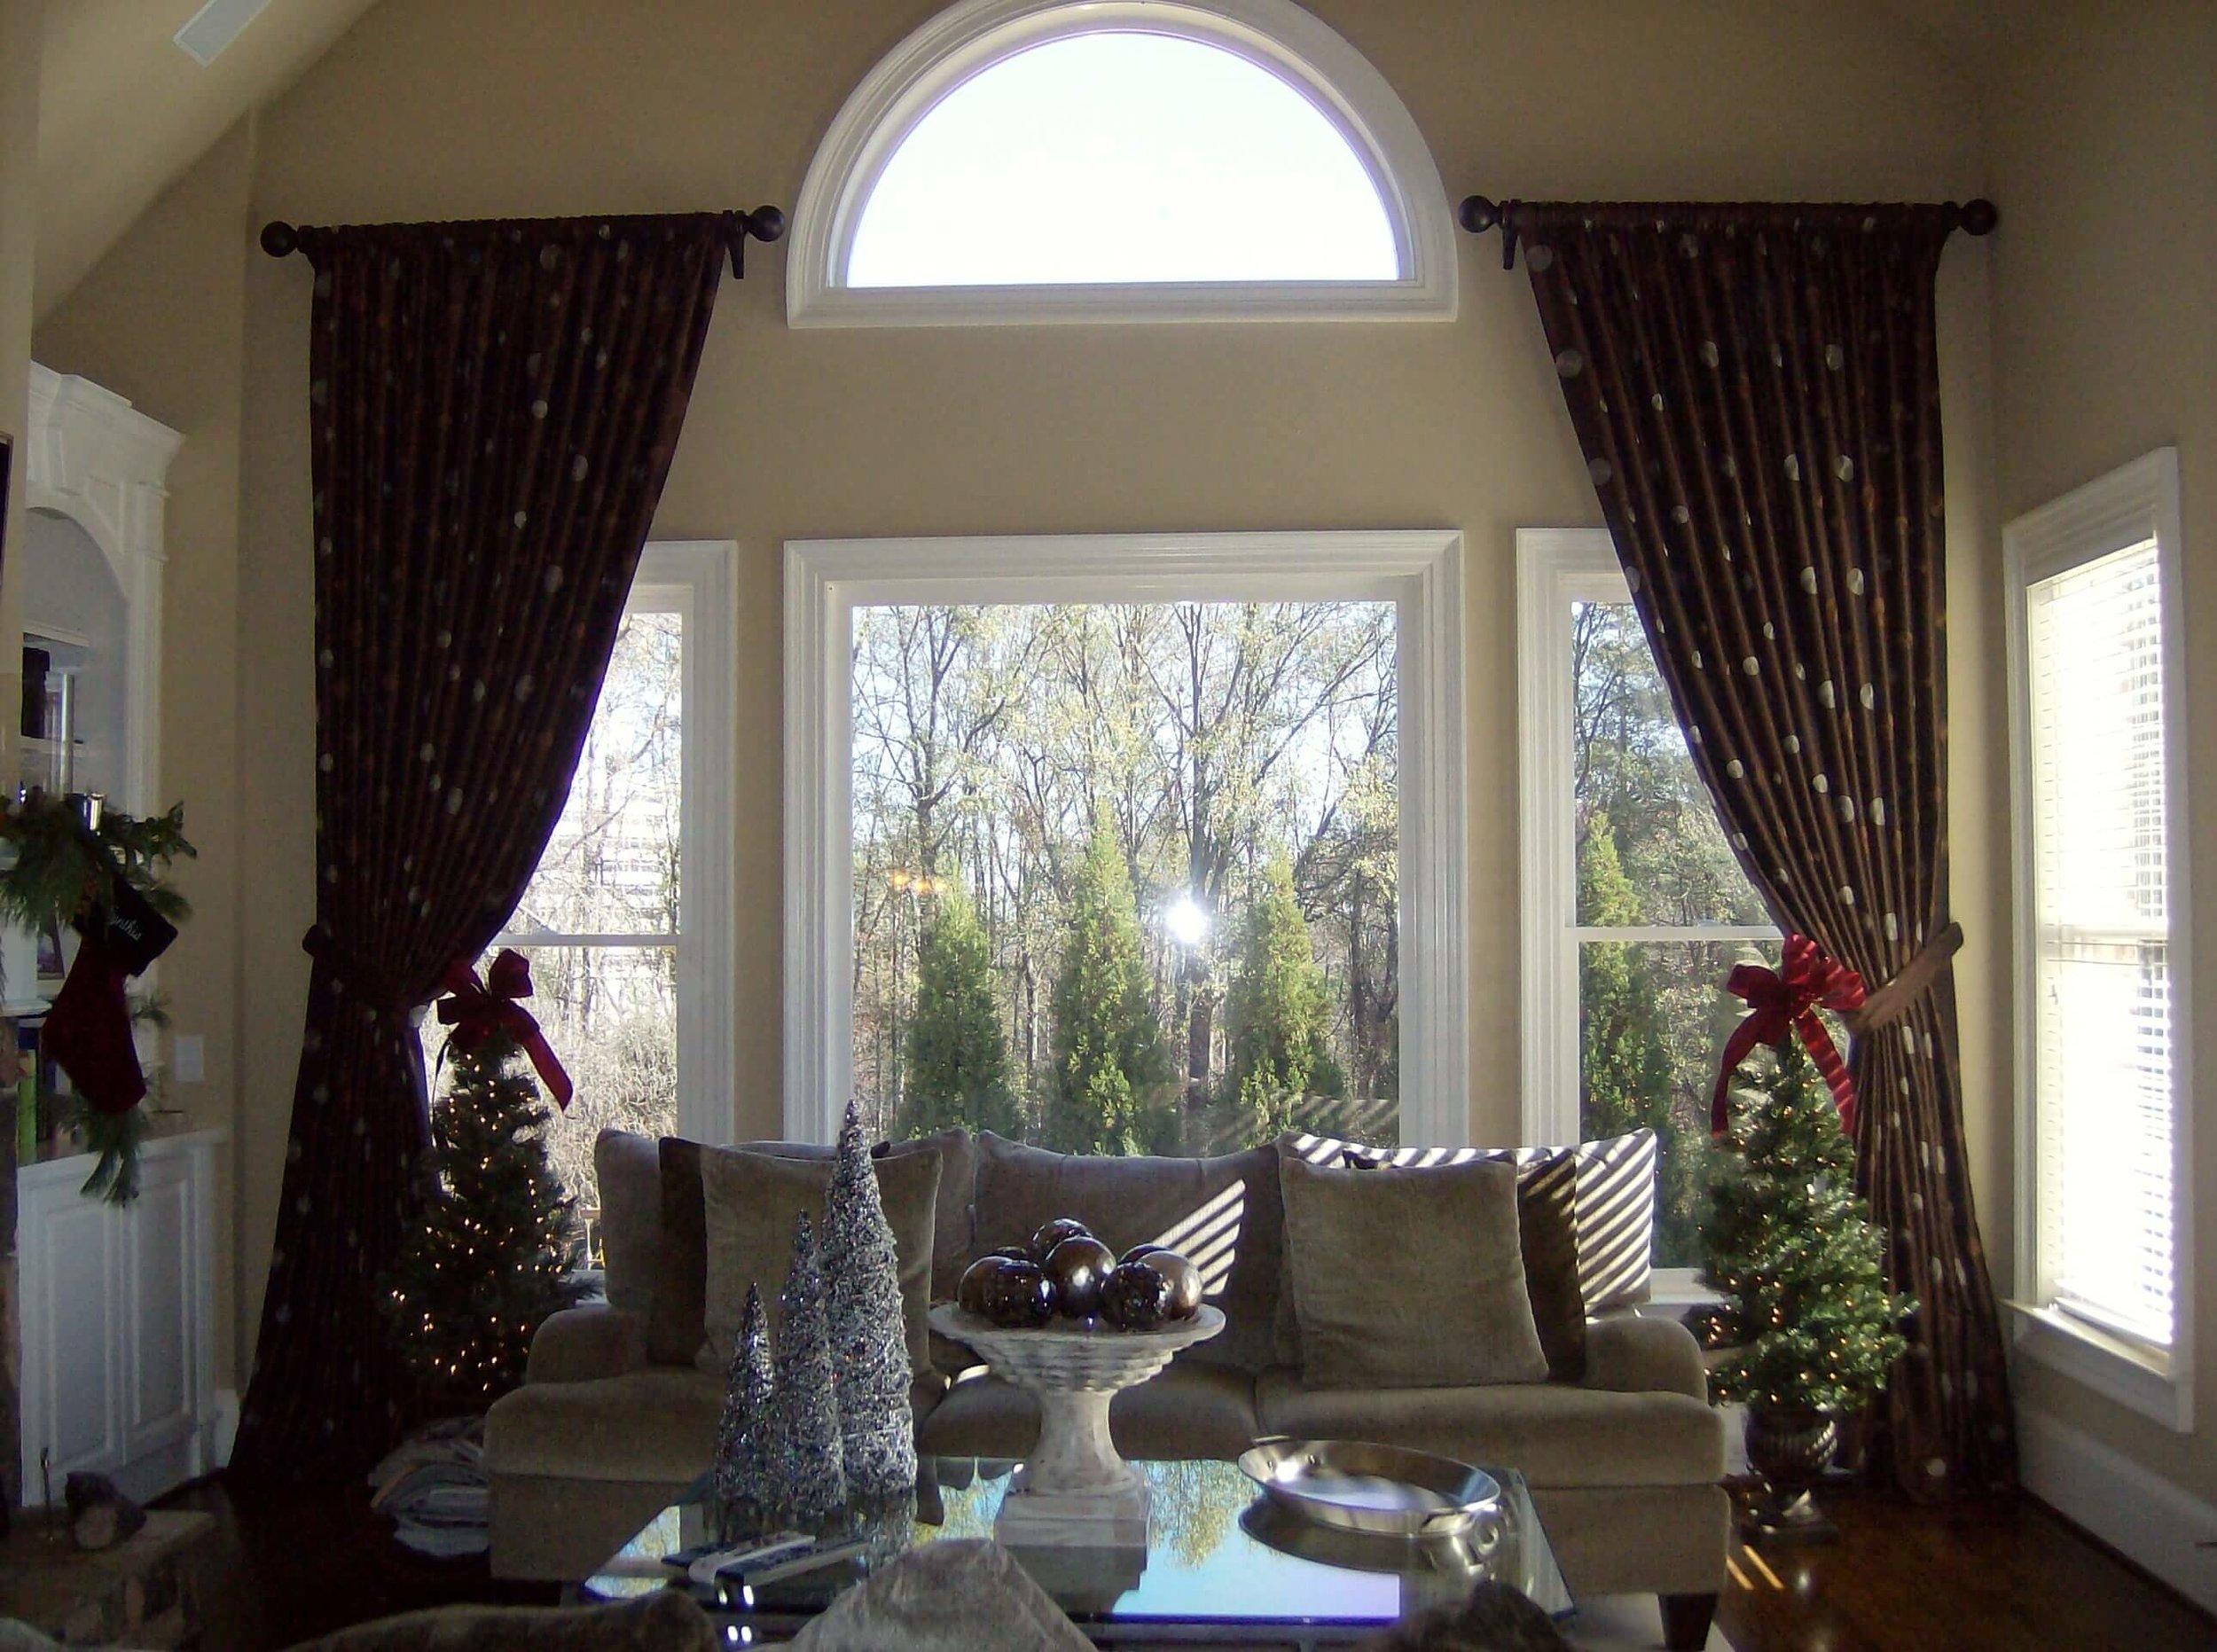 custom-blinds-drapery-shades-interior-design-atlanta-georgia-37.JPG